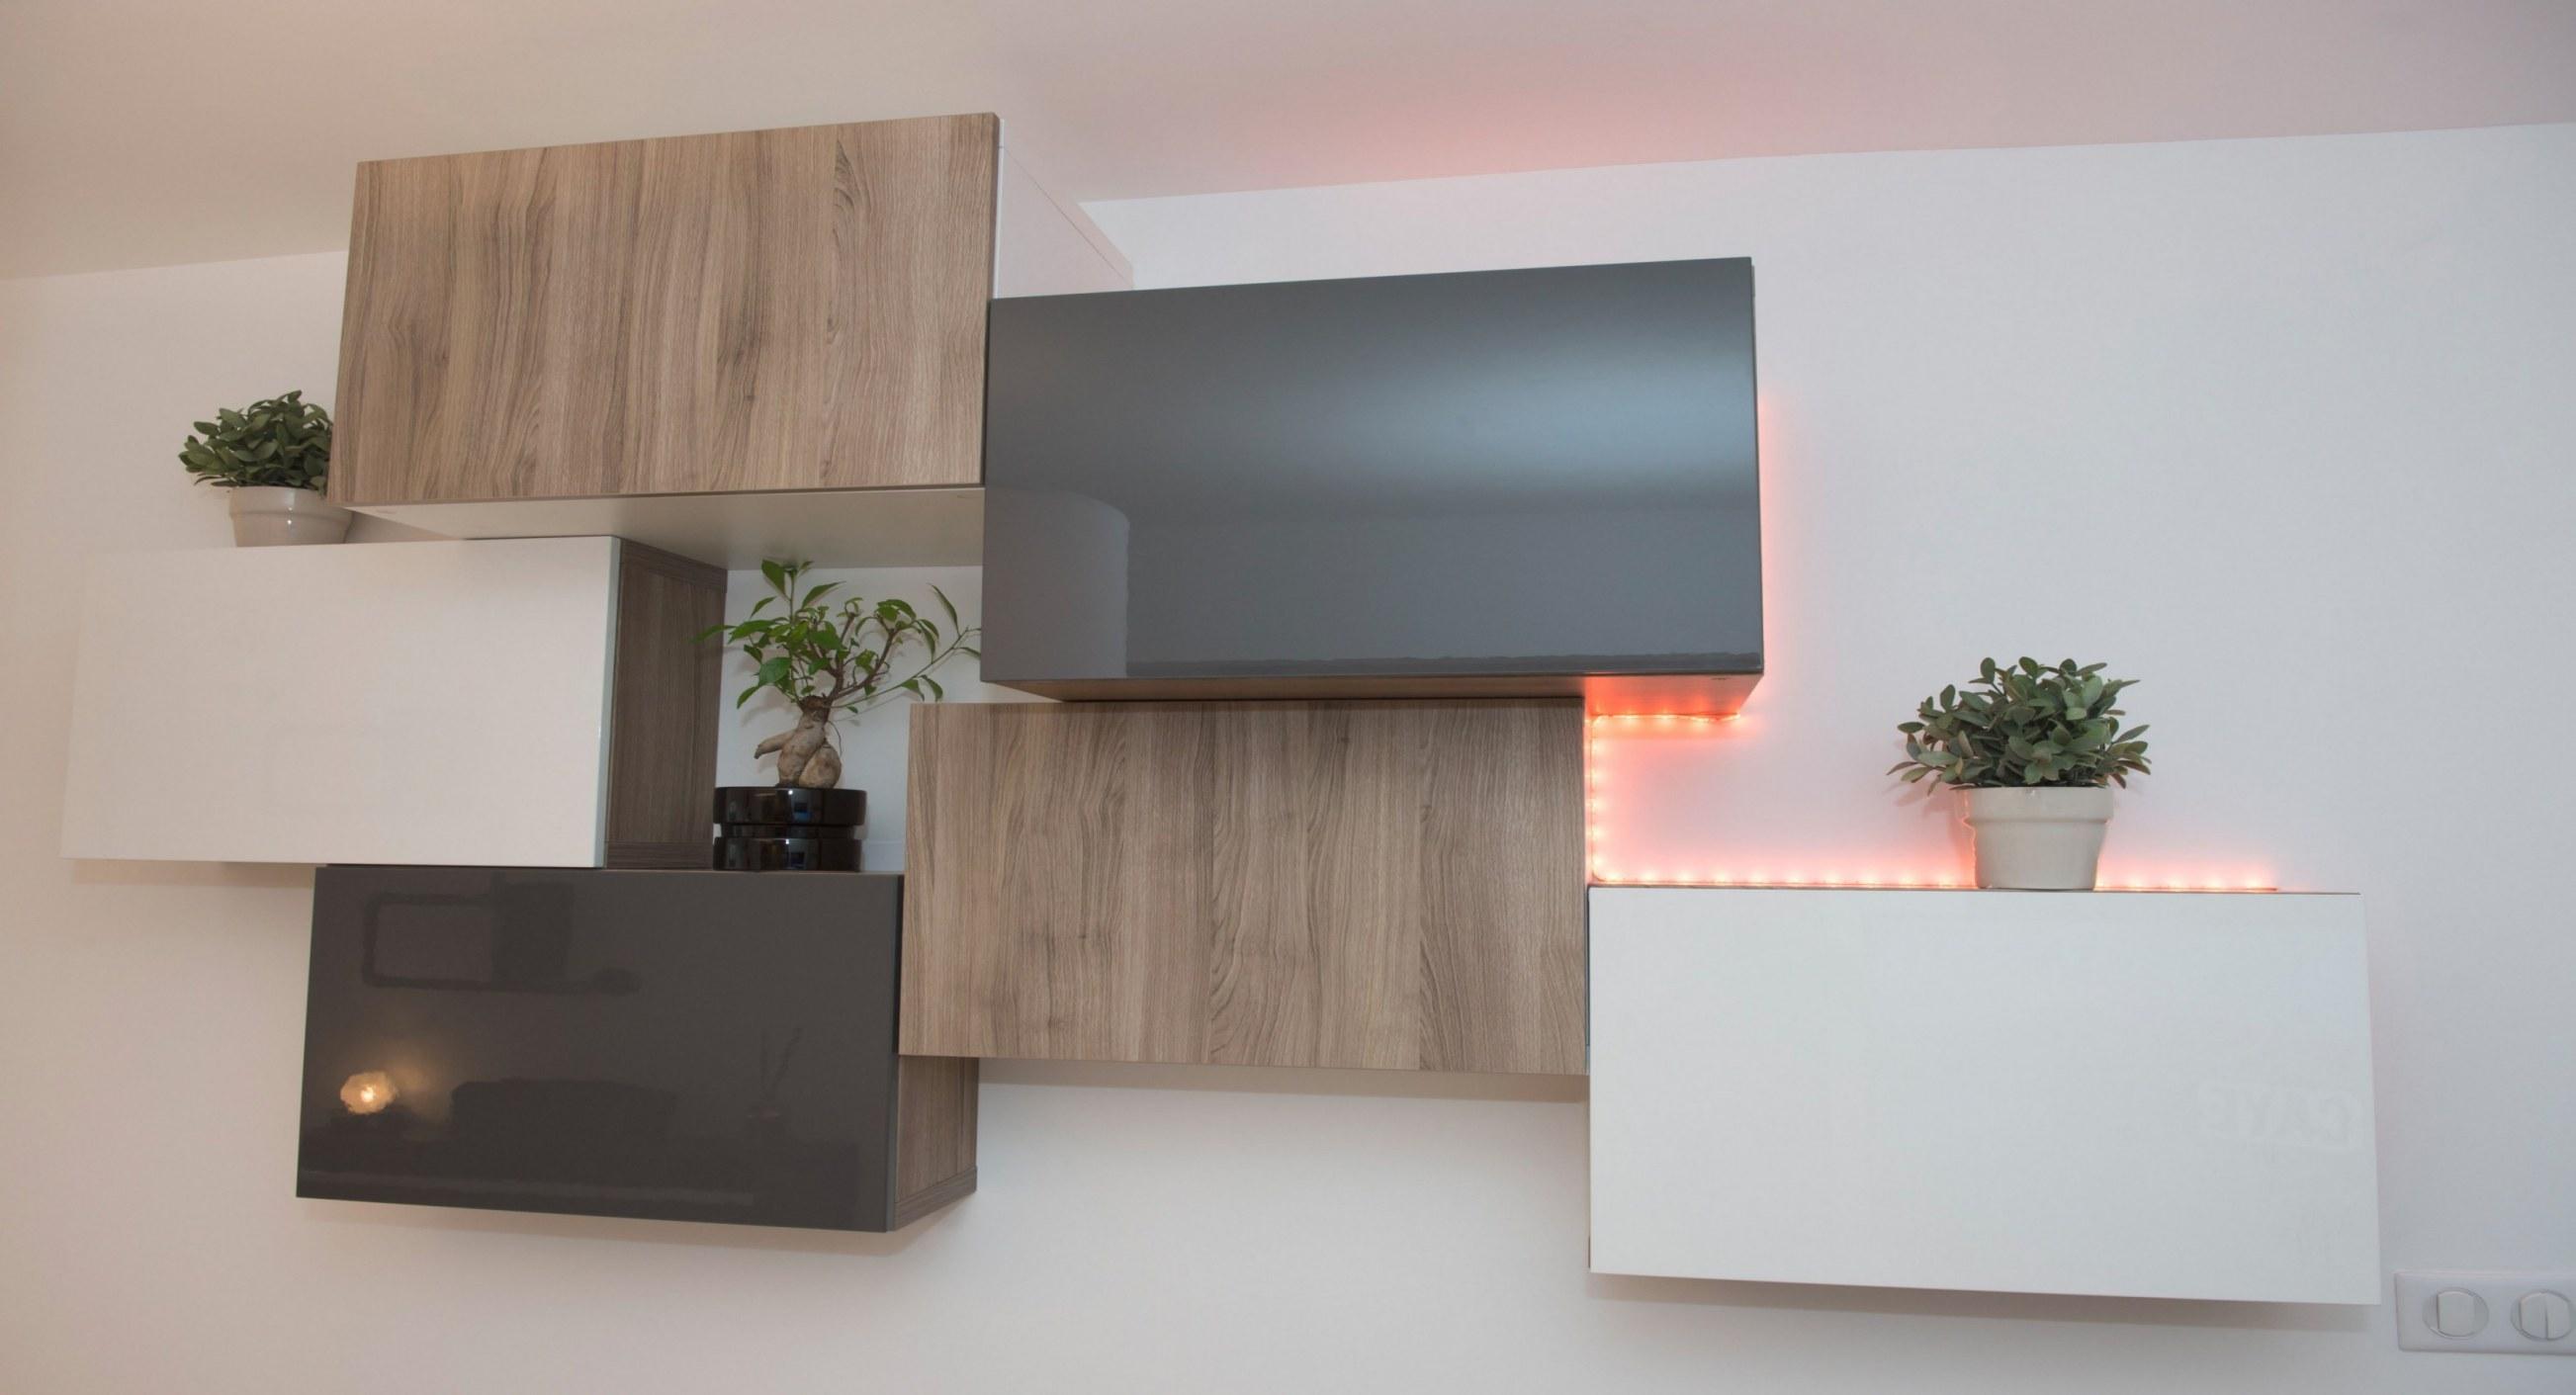 ikea furniture tv stand faux fireplace ideas tv console design minimaliste meuble tv of ikea furniture tv stand